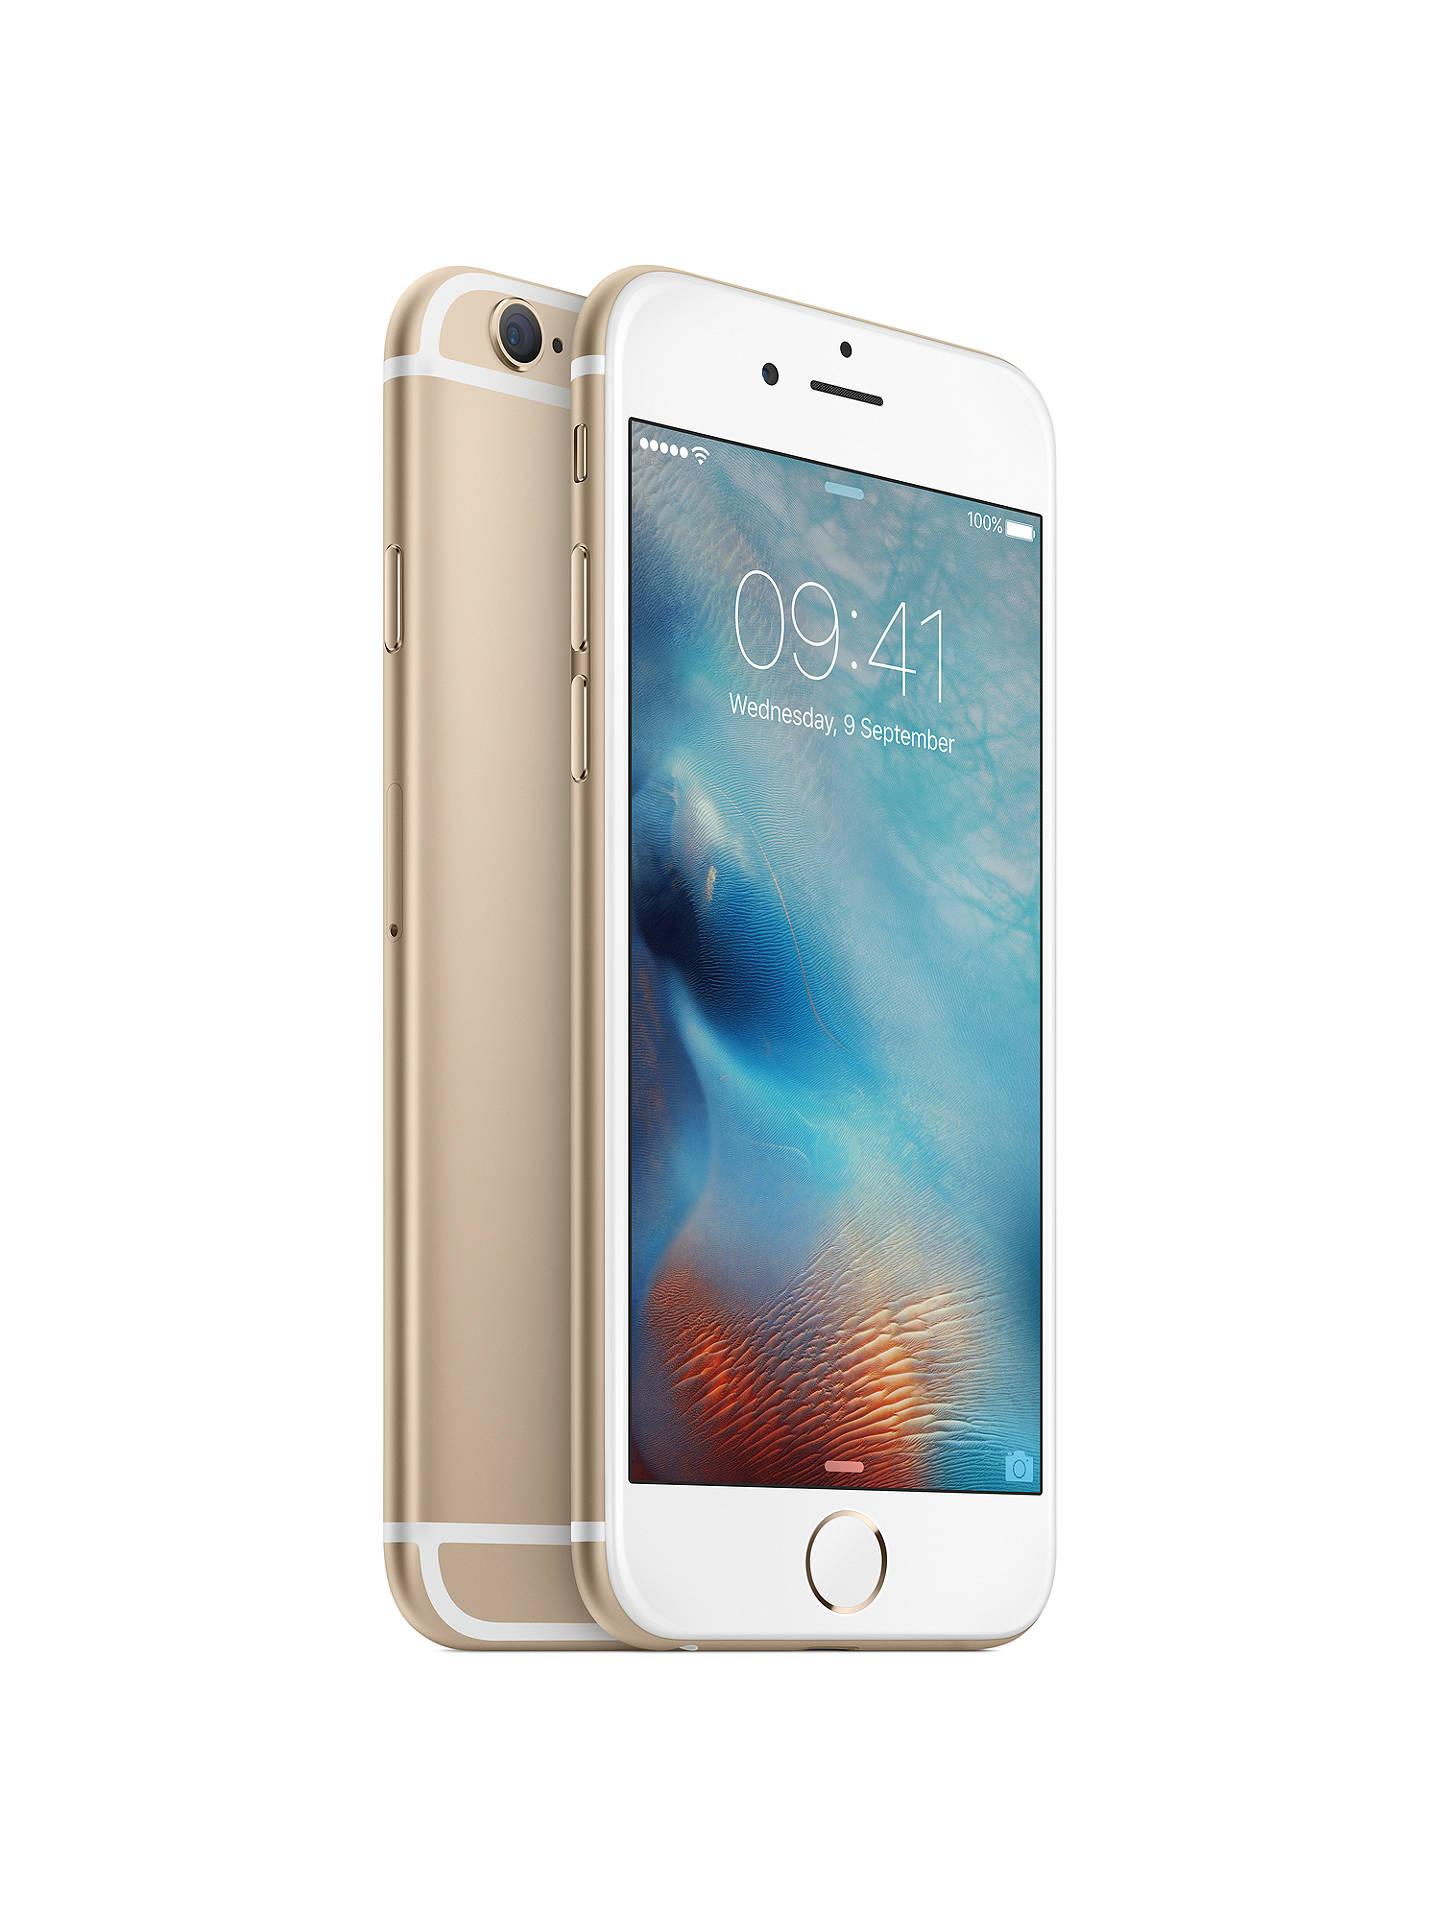 Apple Iphone 6s Ios 47 4g Lte Sim Free 64gb At John Lewis Gold Grey Silver Buyapple